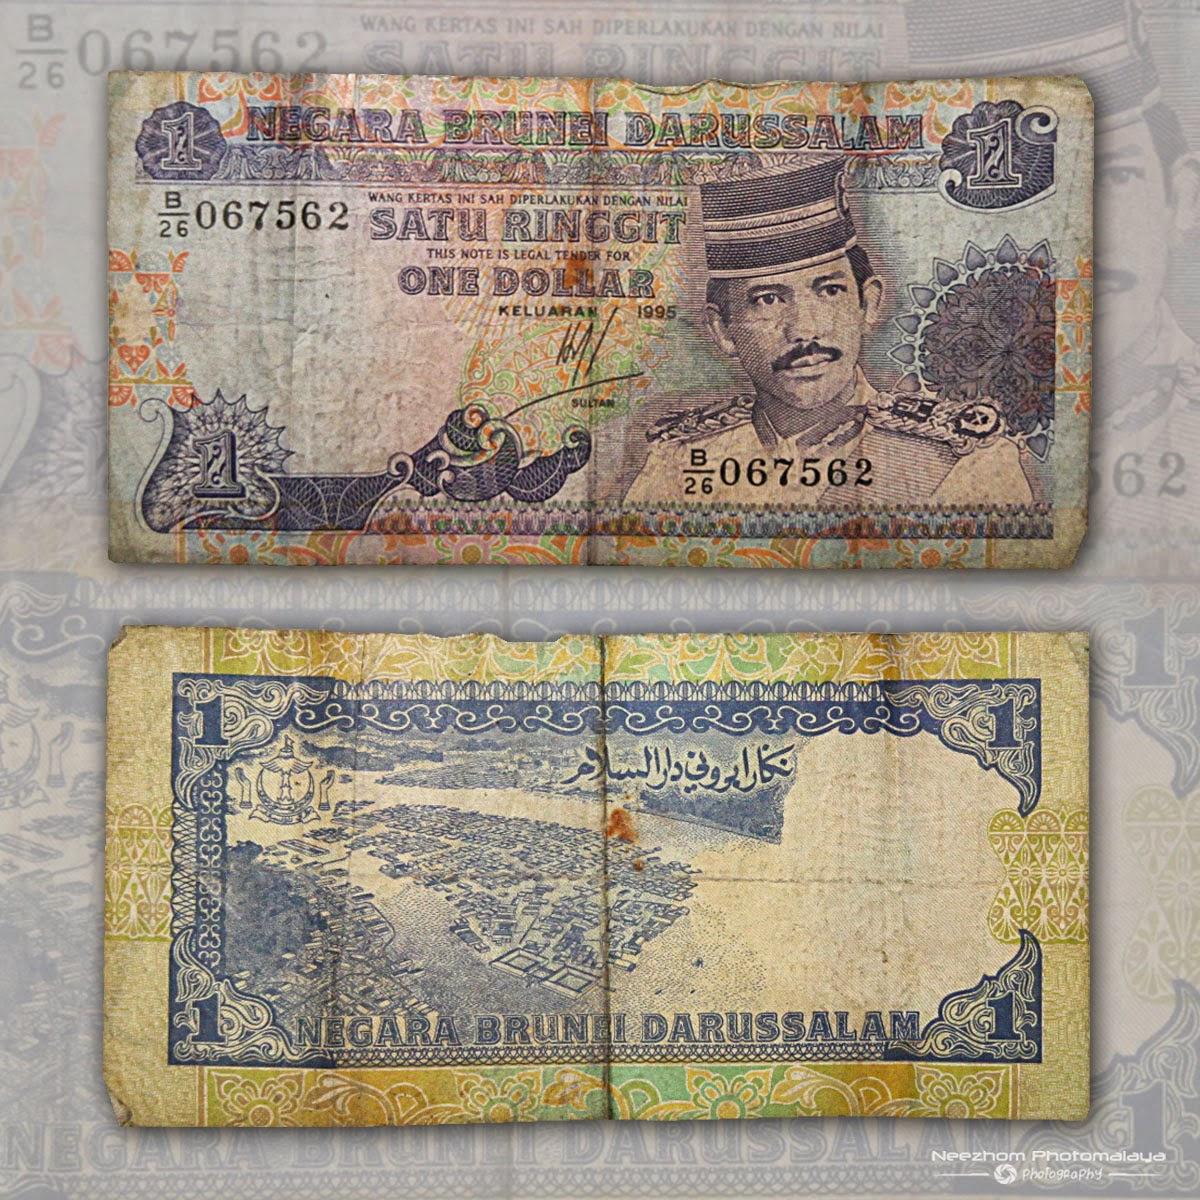 Brunei banknote 1 Dollar 1995